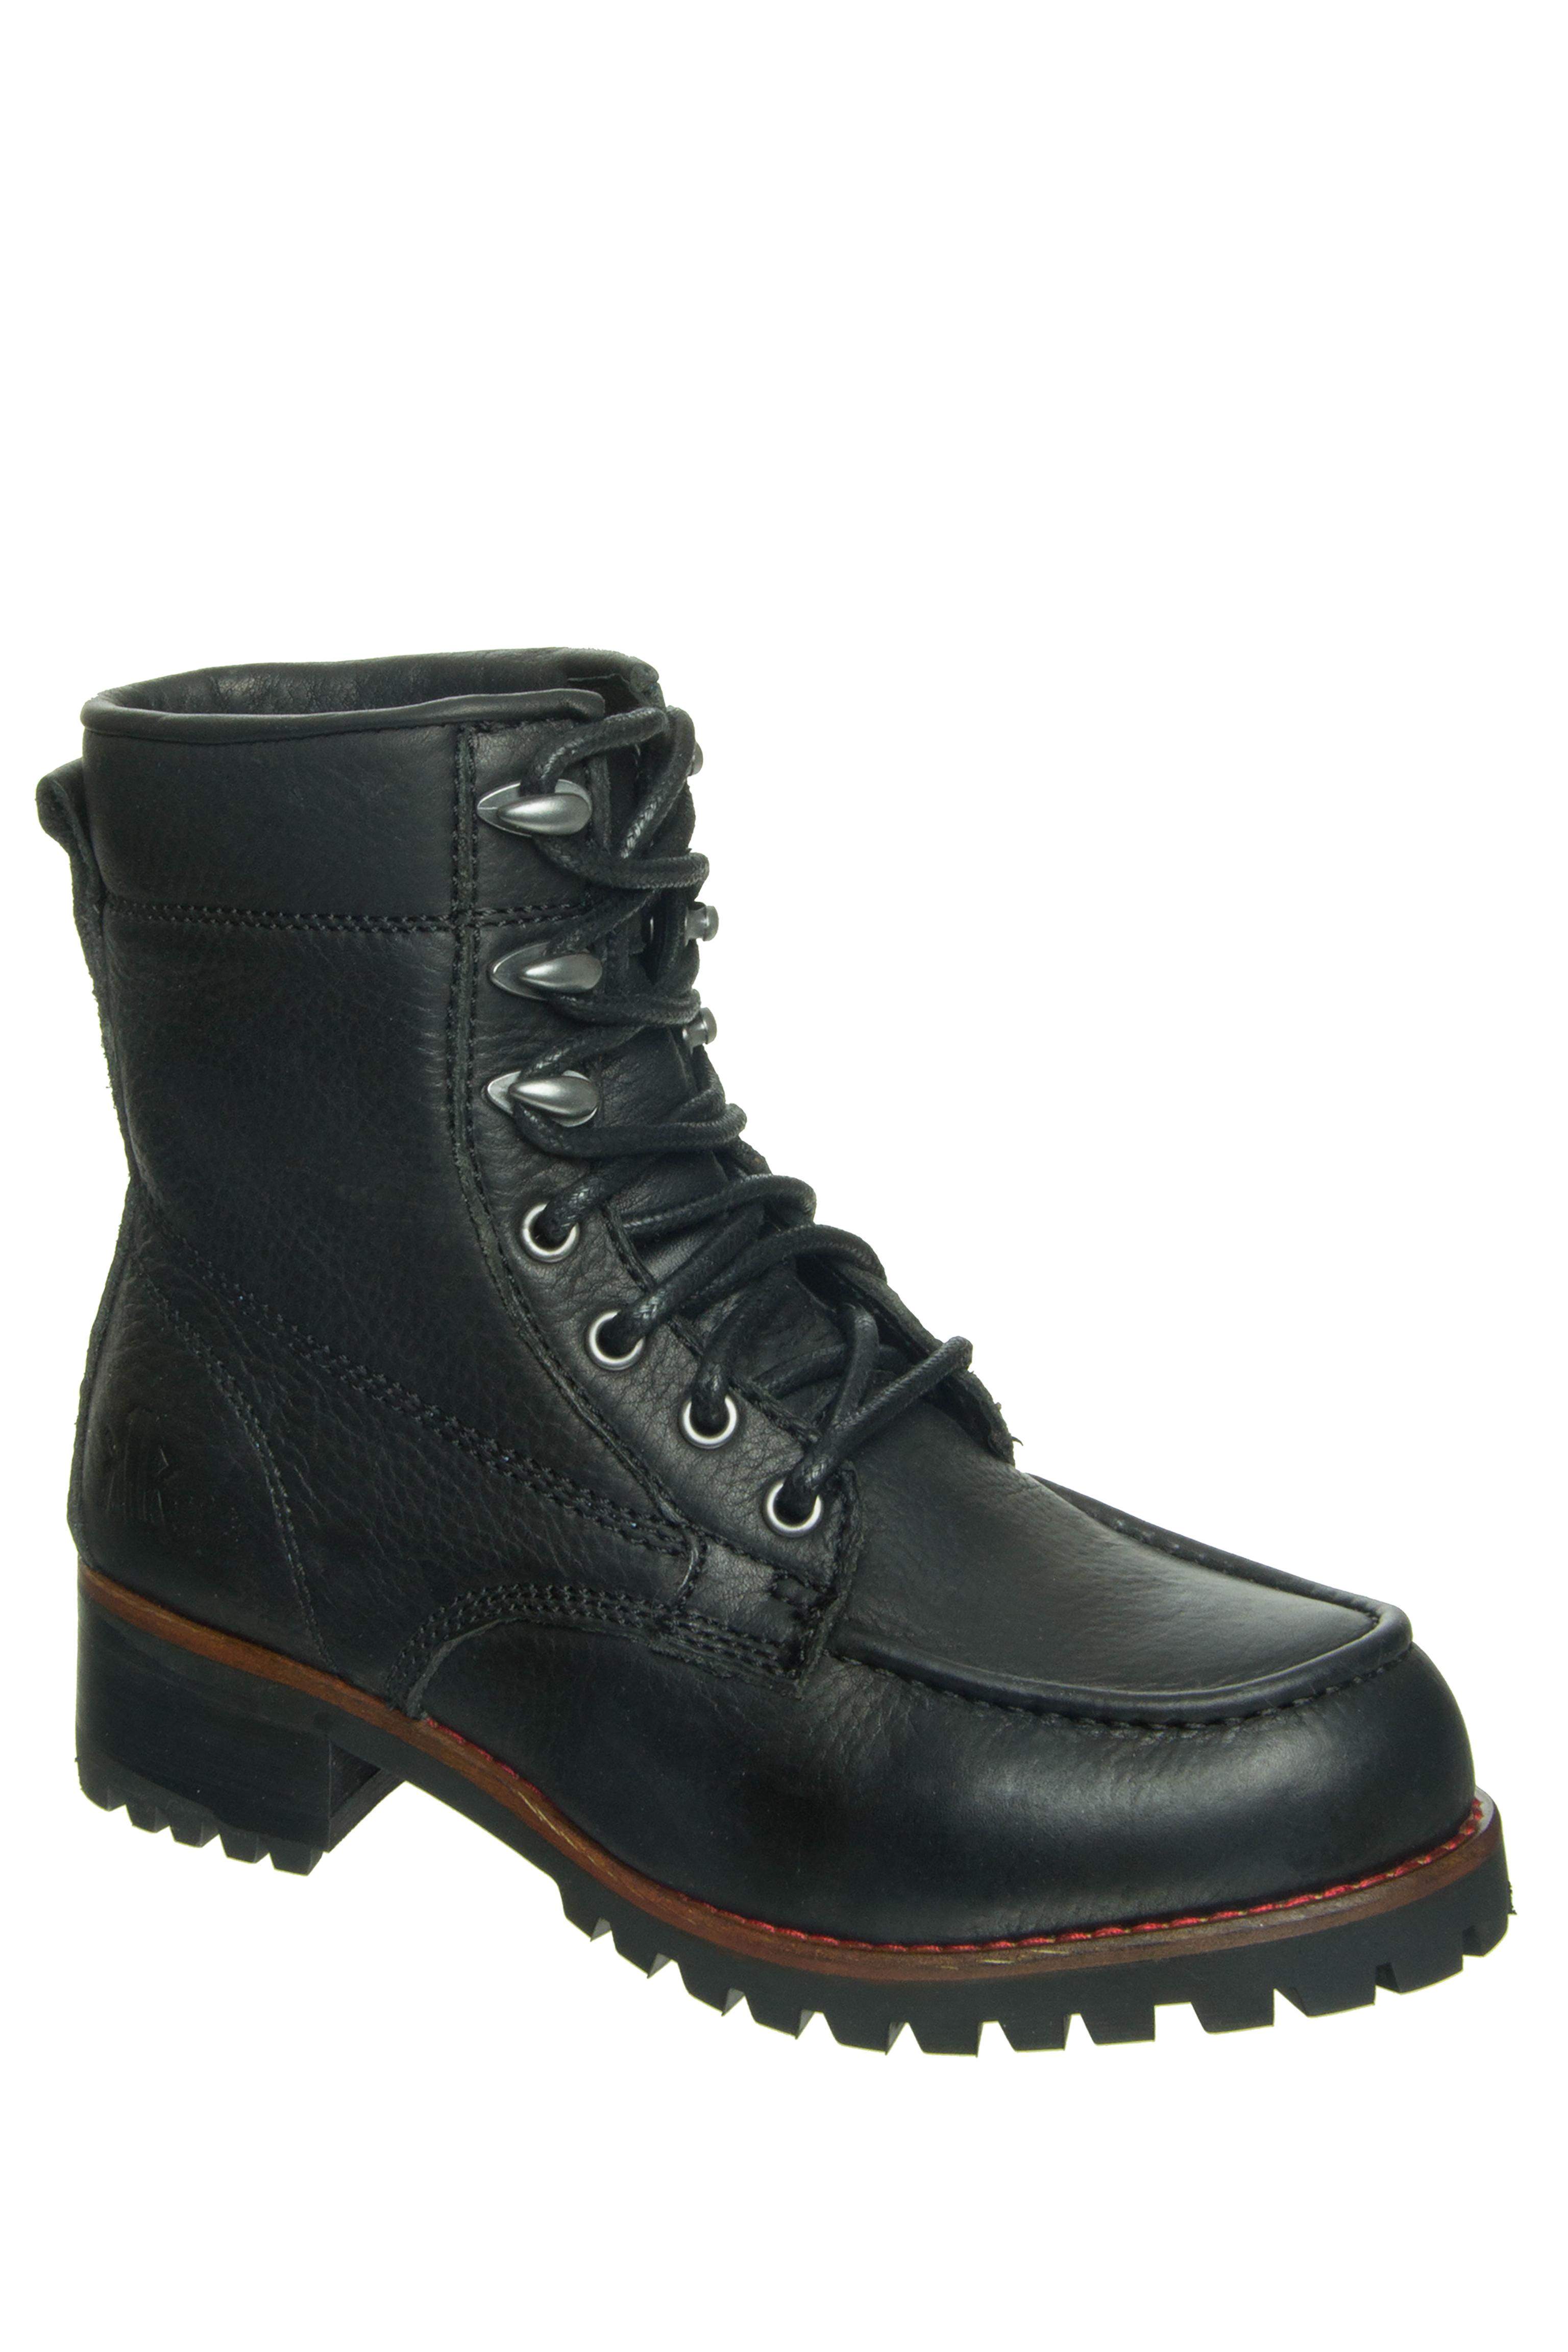 KLR Ryan Logger Low Heel Boots - Black